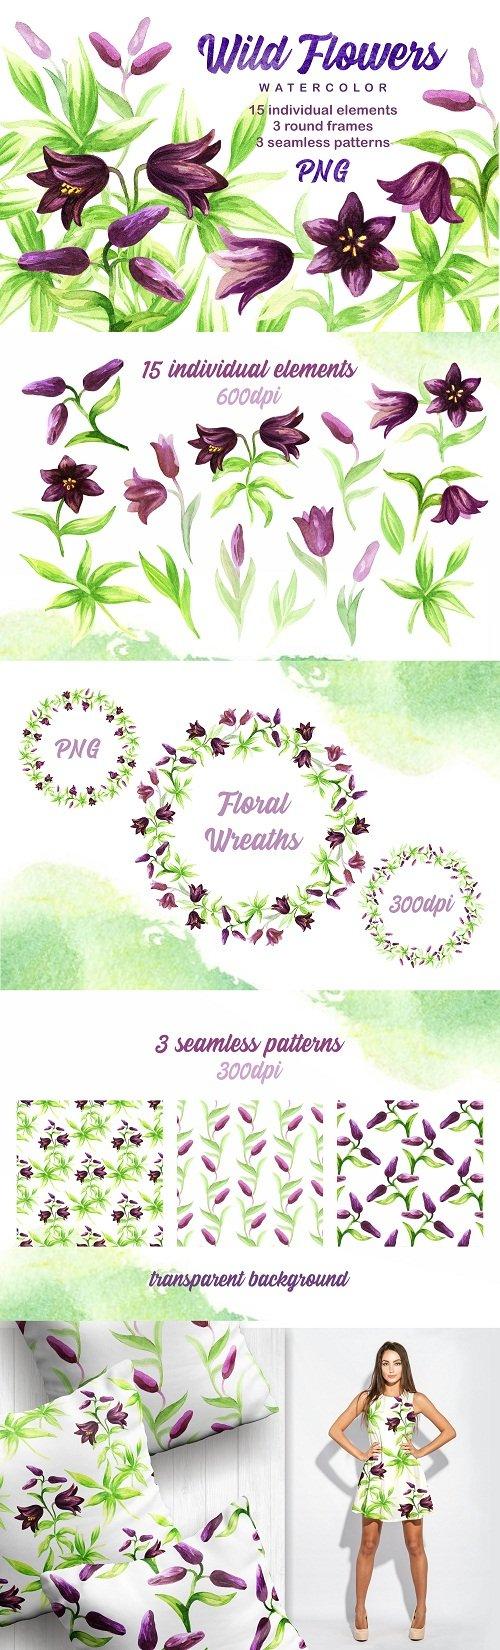 Wild flowers. Watercolor set - 111186